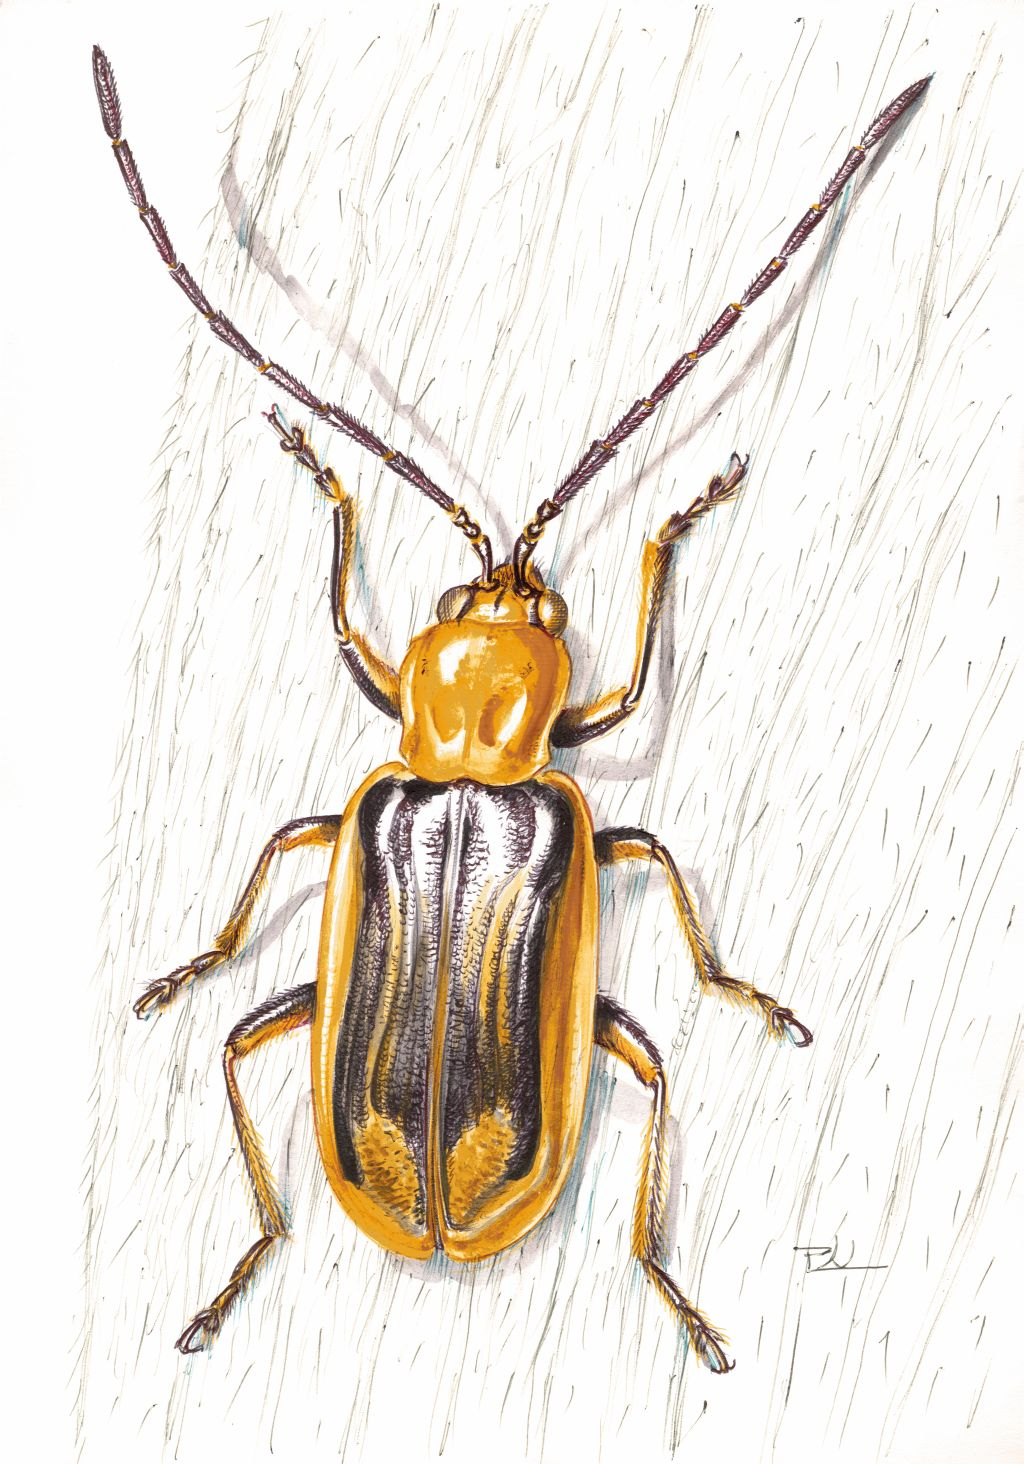 Amerikai kukoricabogár (Diabrotica virgifera)